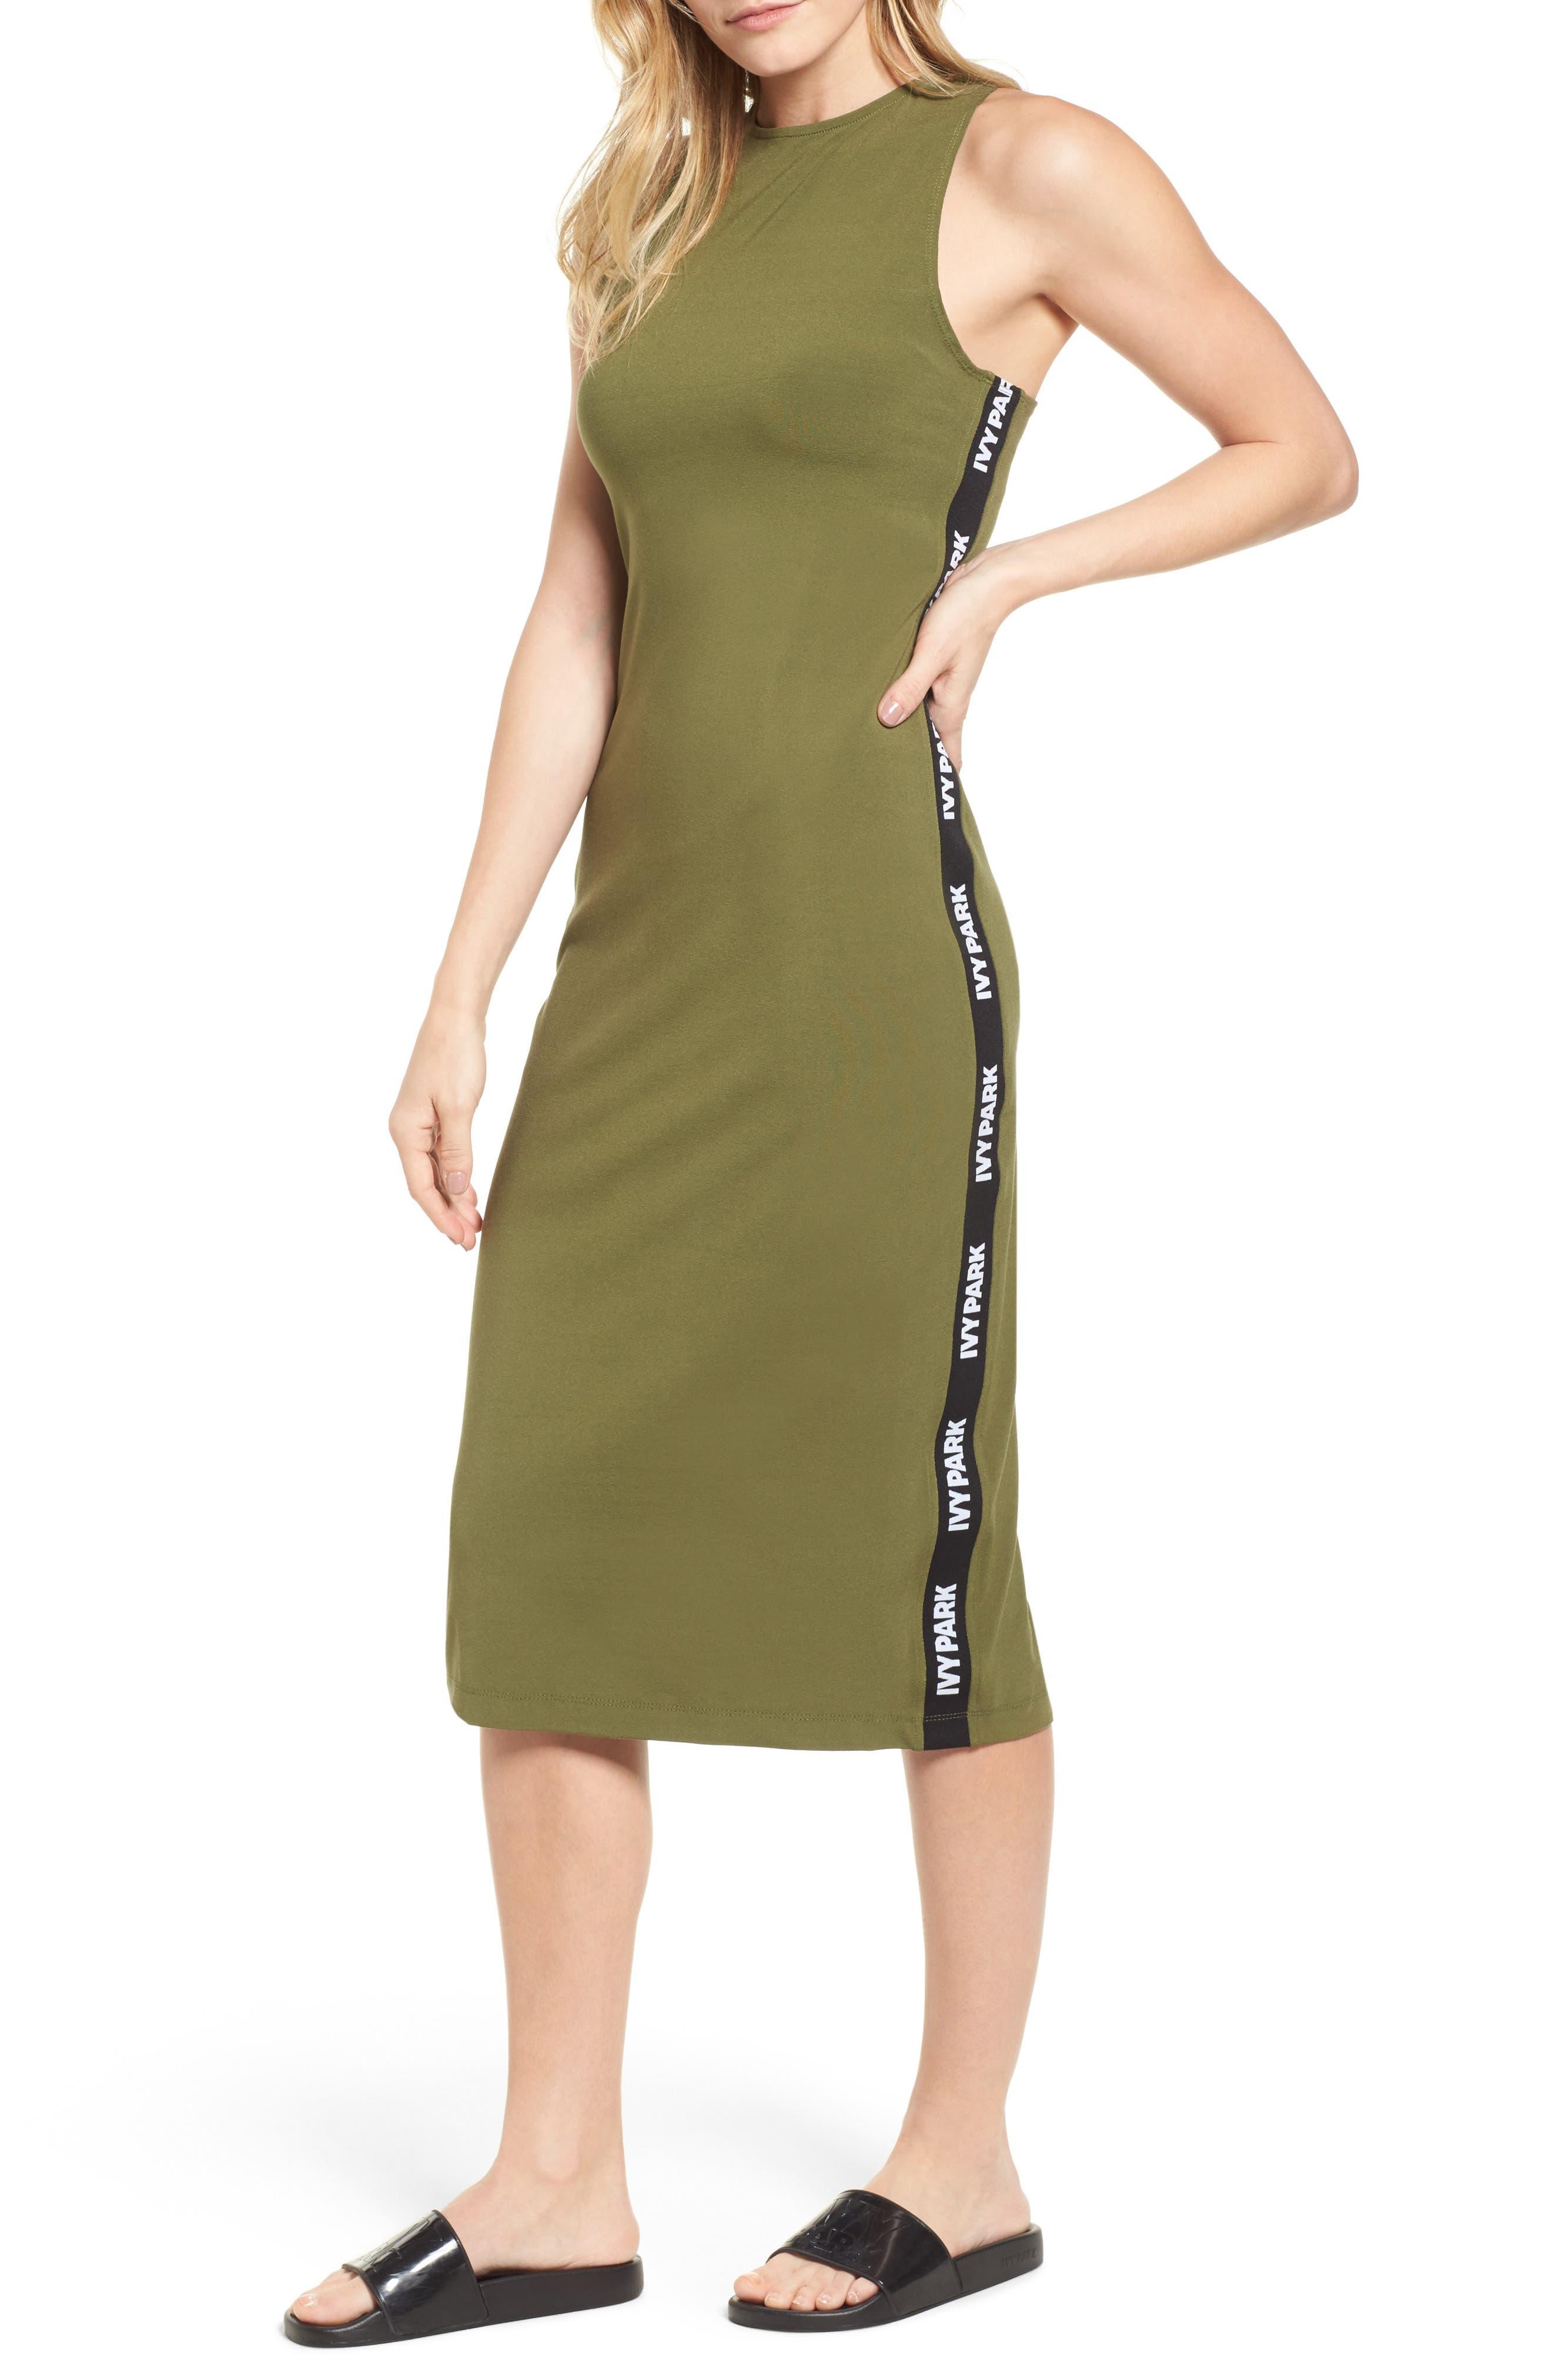 IVY PARK® Logo Tape Dress